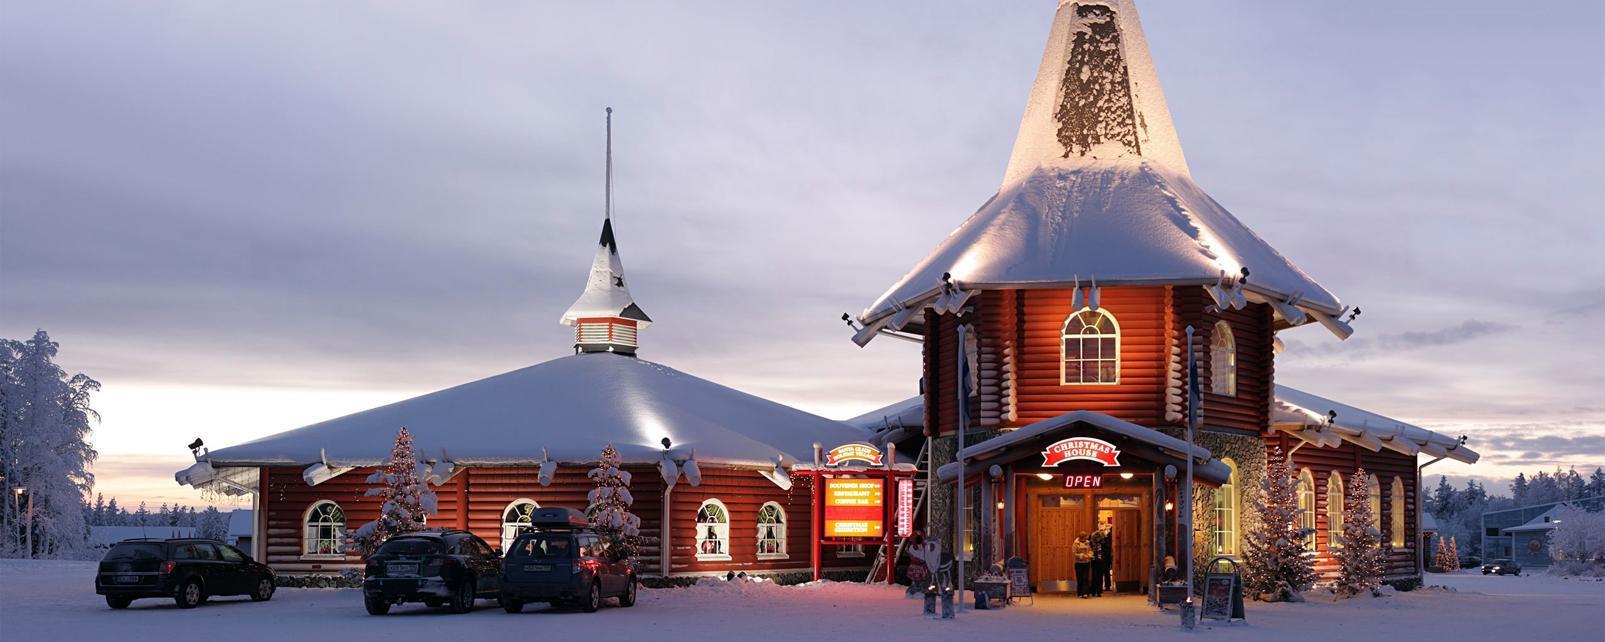 Santa Claus Village Hotel